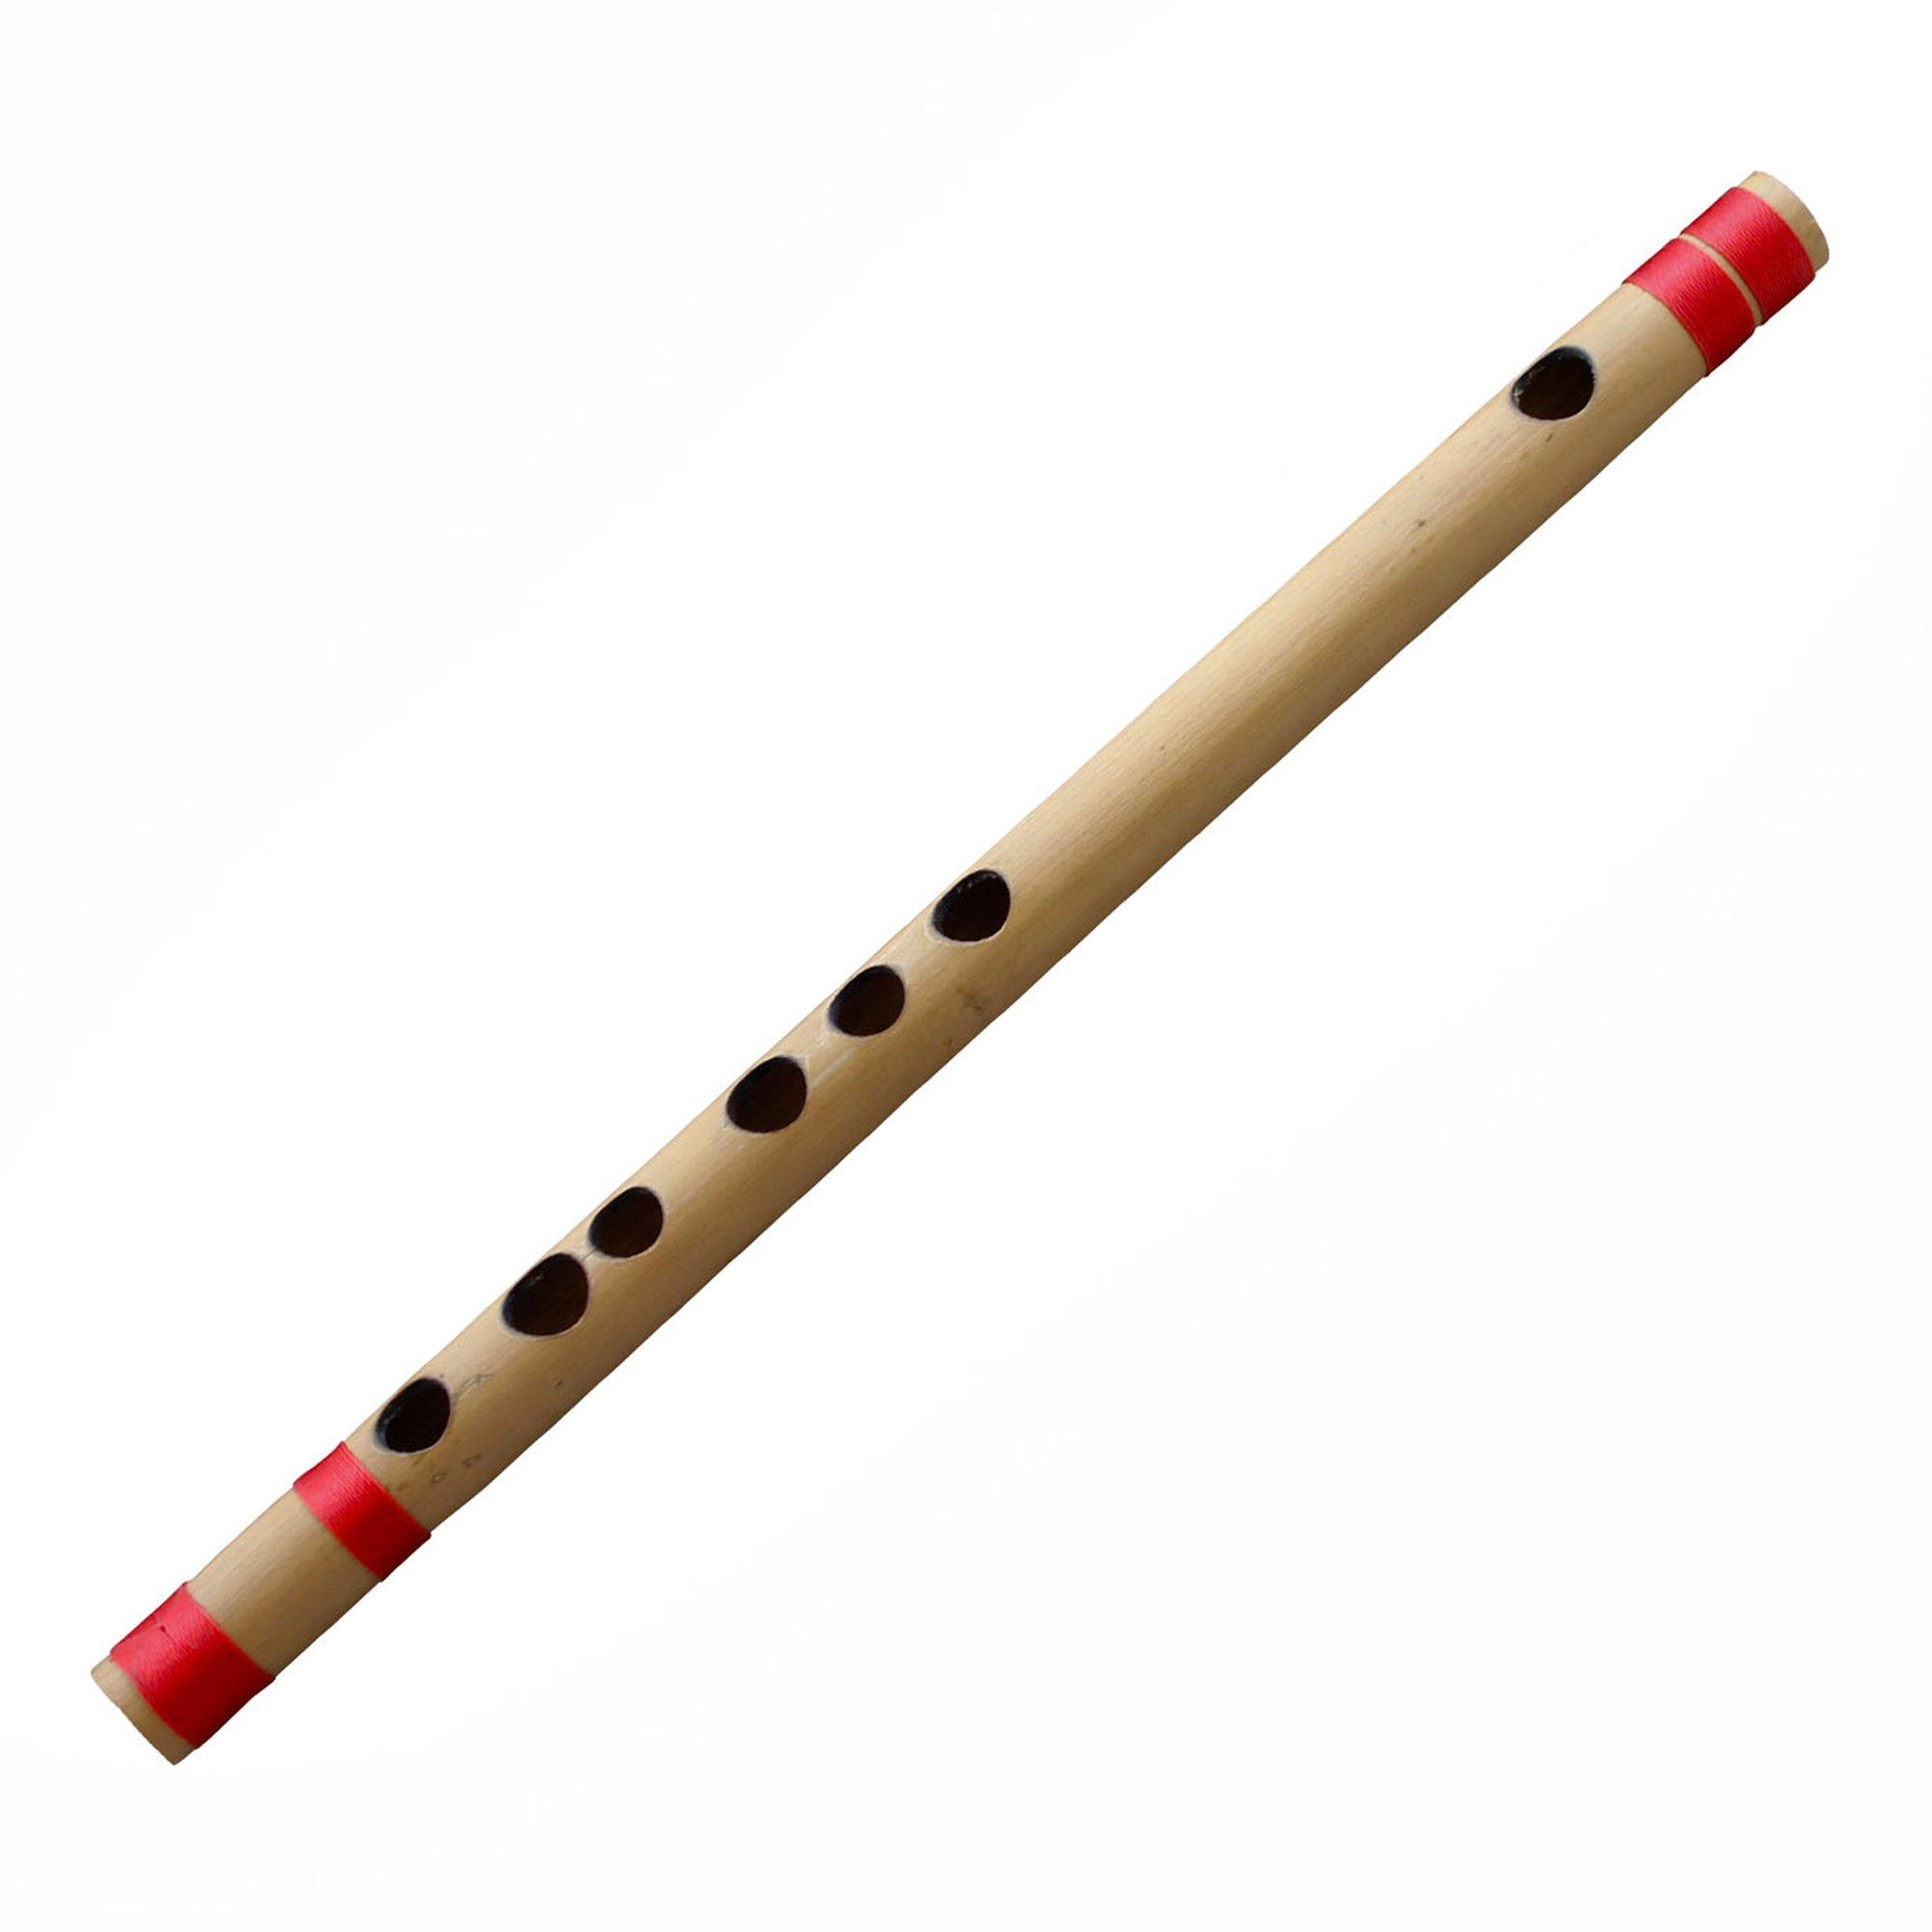 Bamboo Flute Indian Bansuri, B Key, 10 Inches Long - Professional Transverse Woodwind Musical Instrument